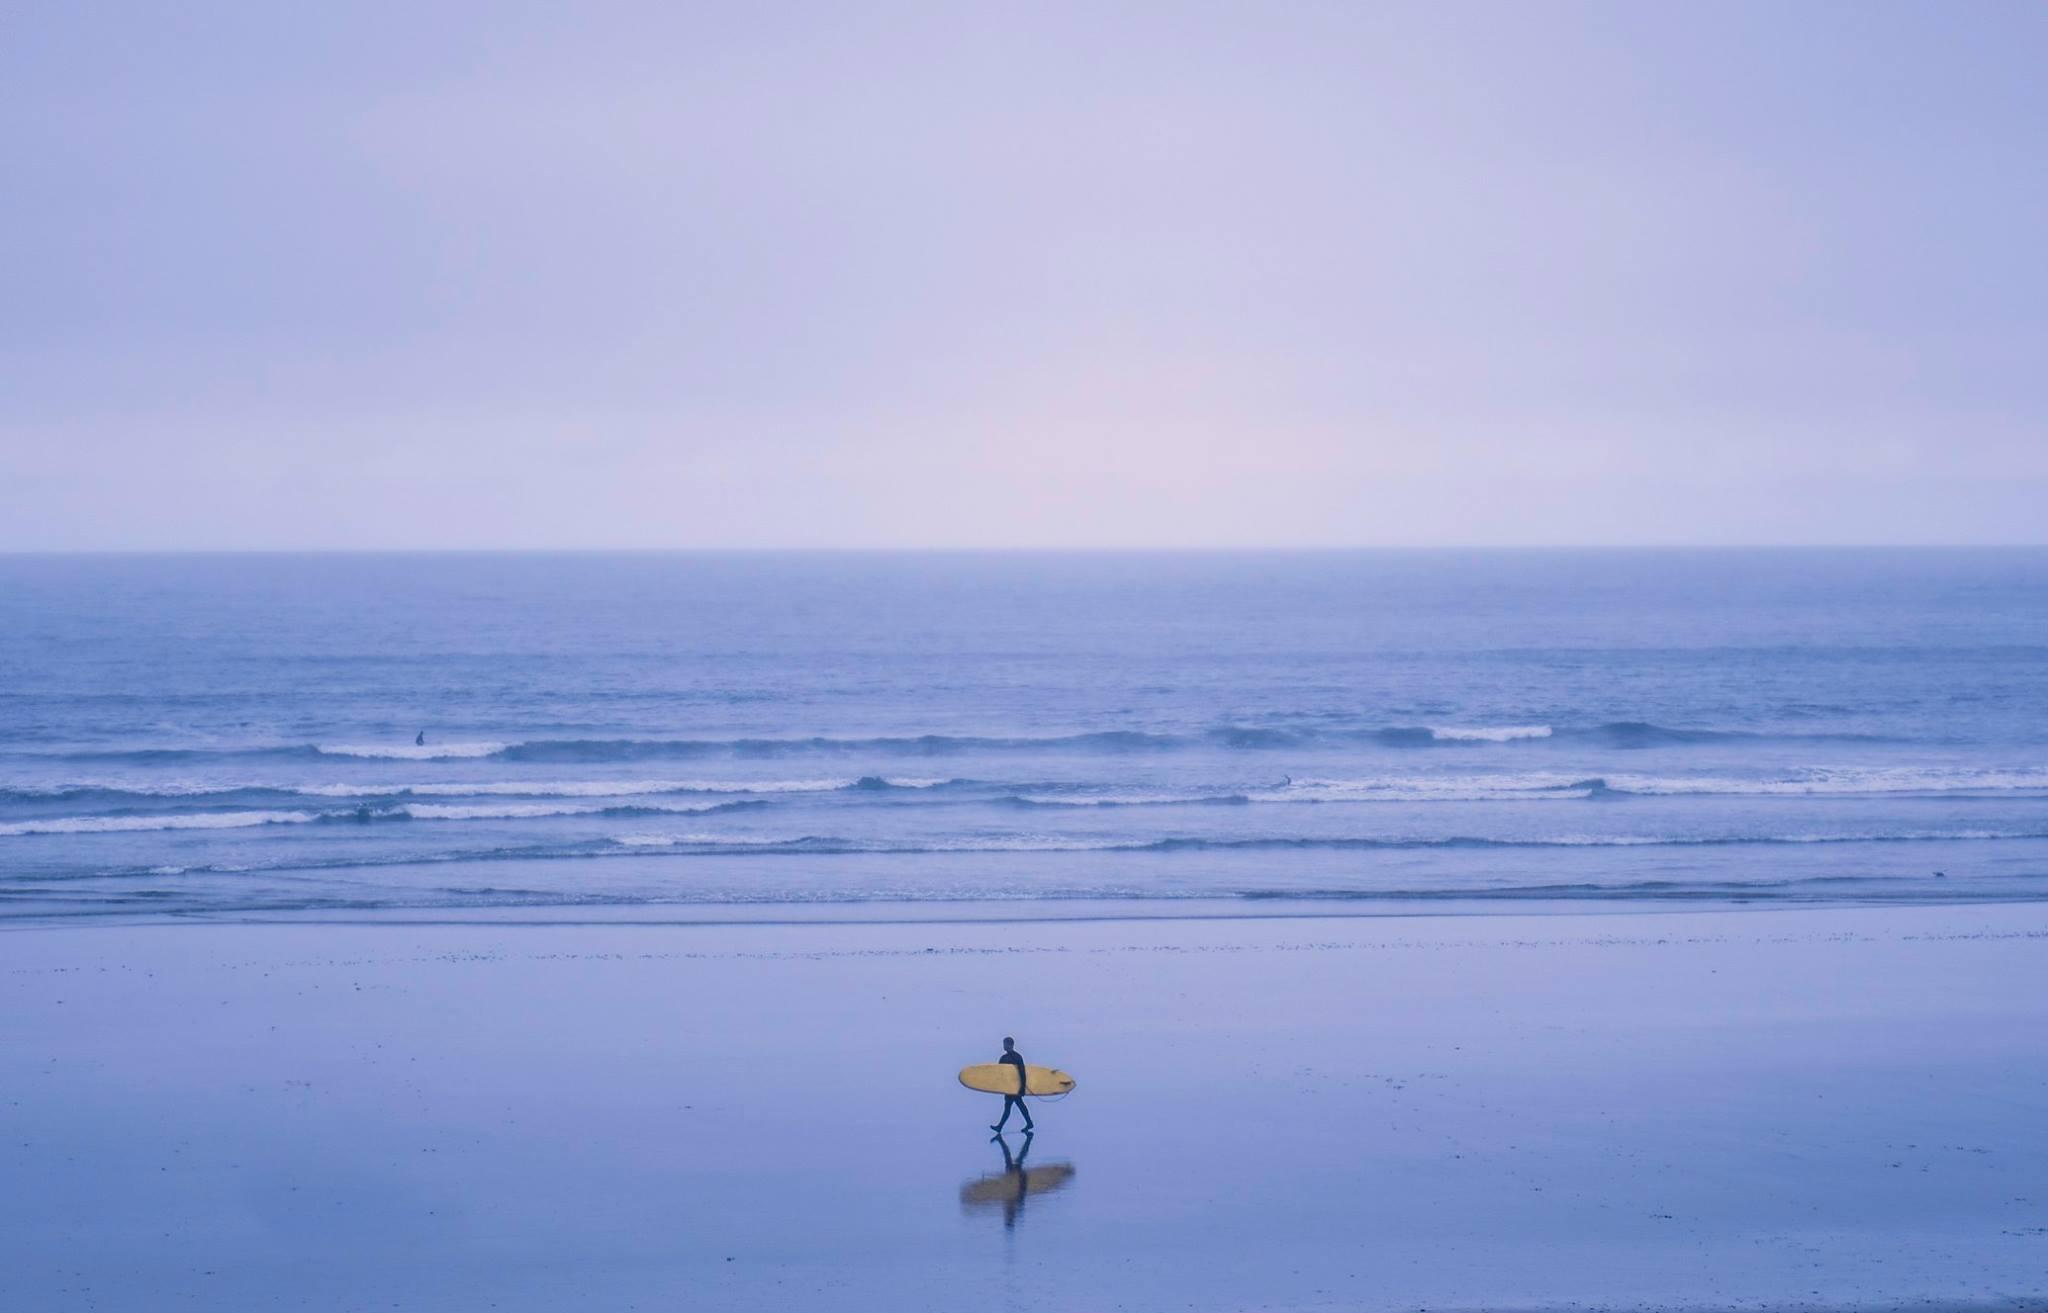 Surfing Pic.jpg